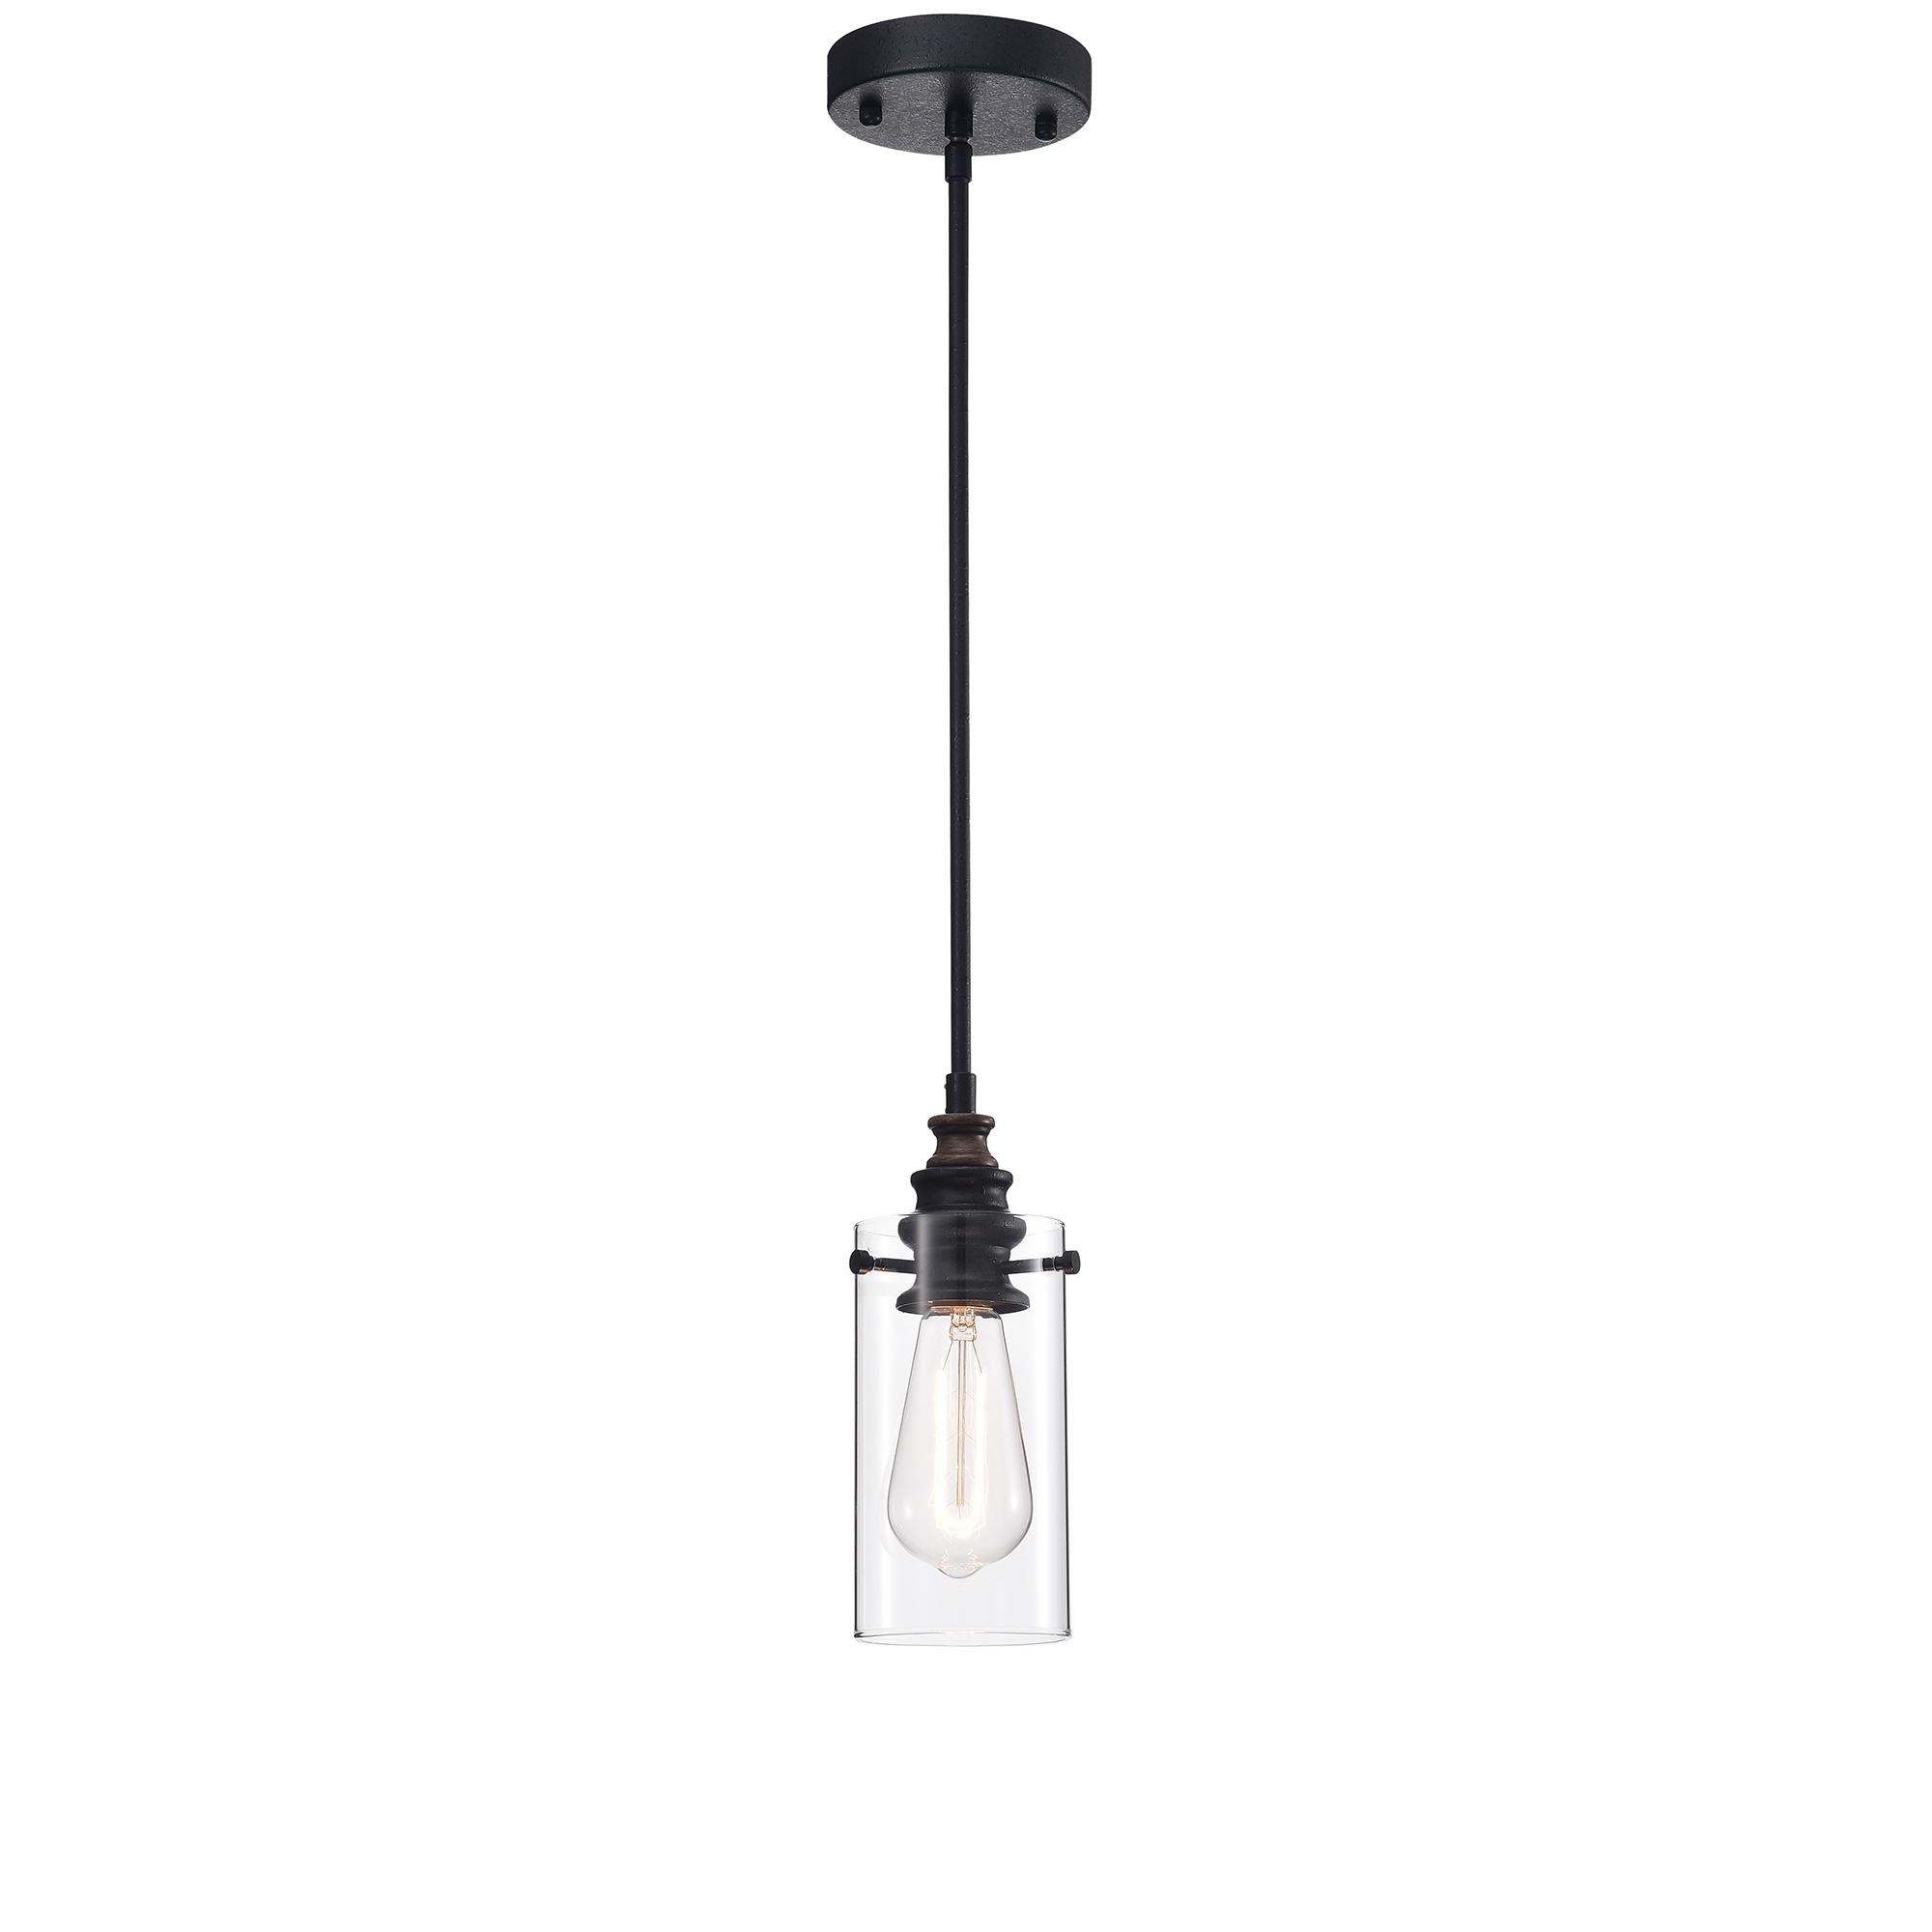 Tedosha 1-light Black Pendant Lamp with Glass Cylinder Shade (includes Edison Bulb)